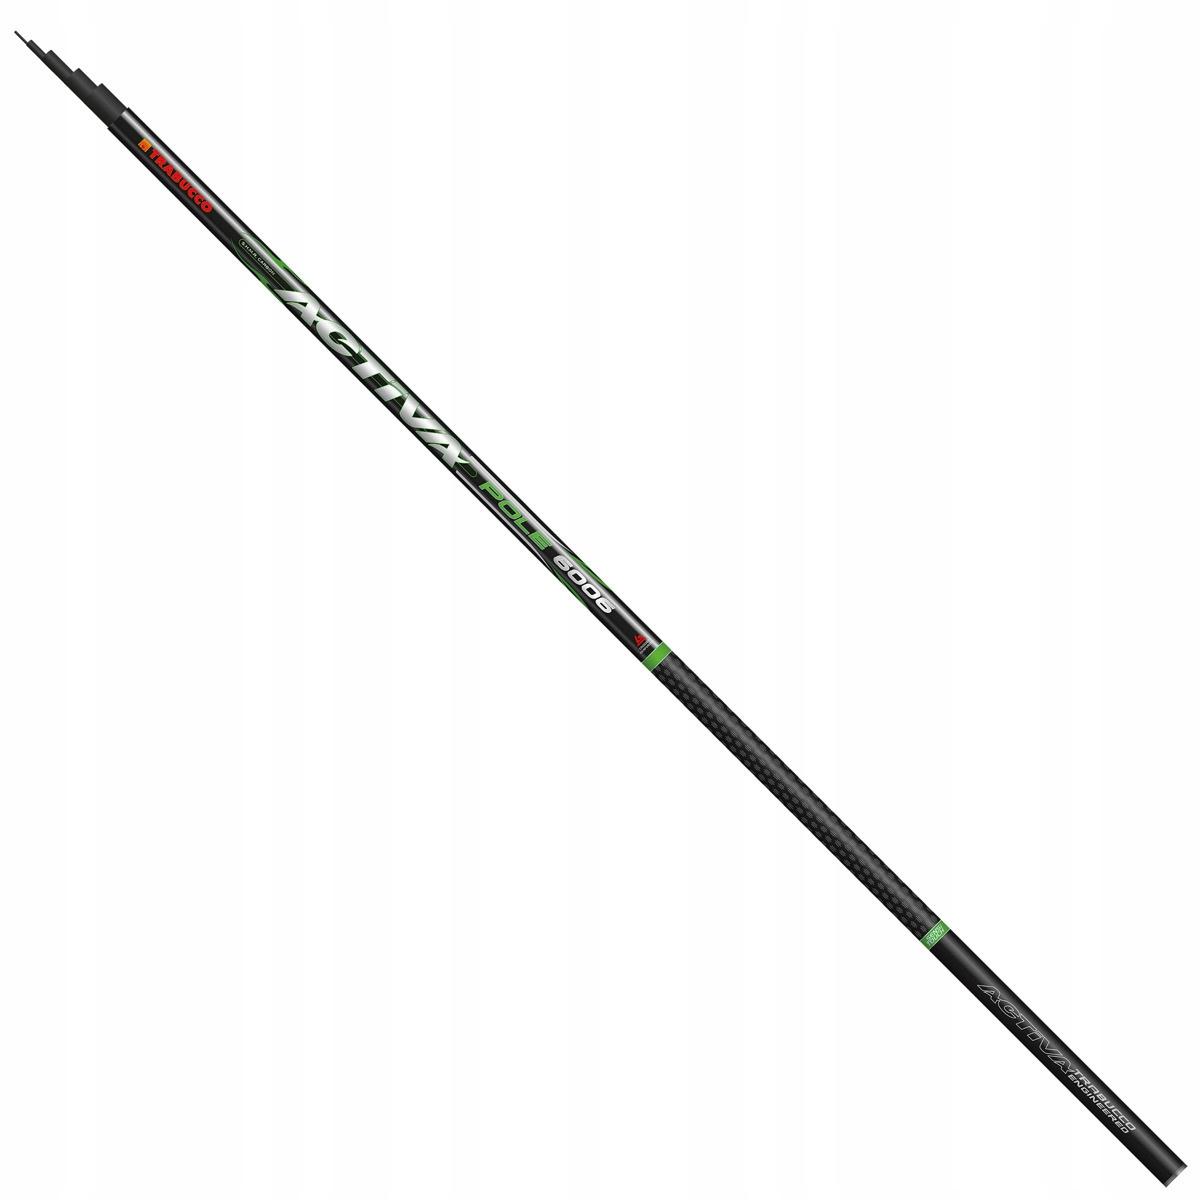 Wędka Bat Trabucco Activa Pole 7m + GRATIS